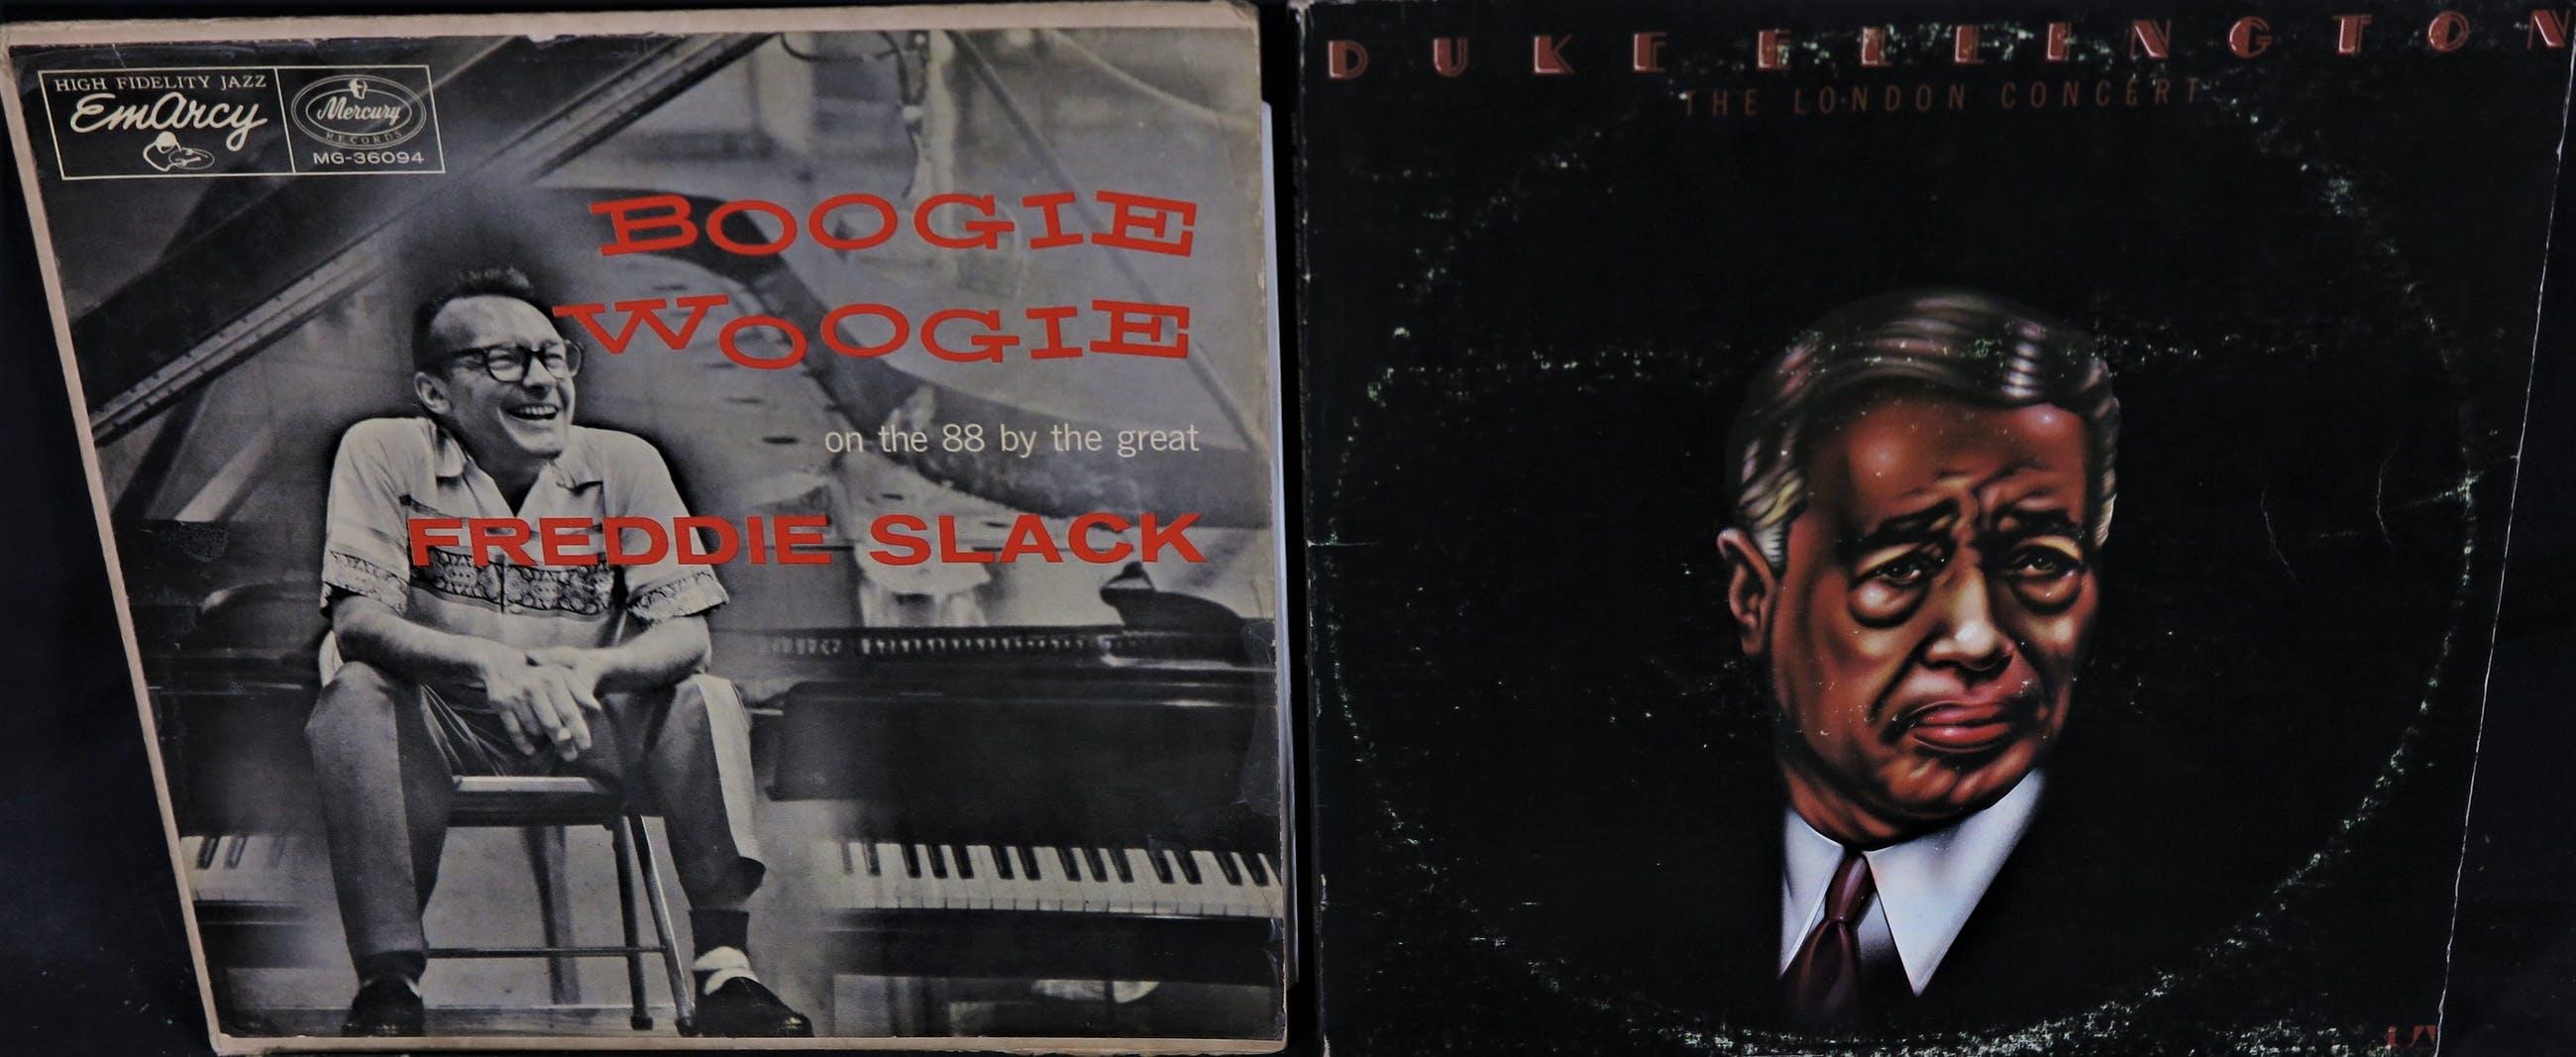 Various artists - 4 Jazz LP's: Lionel Hampton, Duke Ellington, Ray Charles, Freddie Slack kopen? Bied vanaf 10!